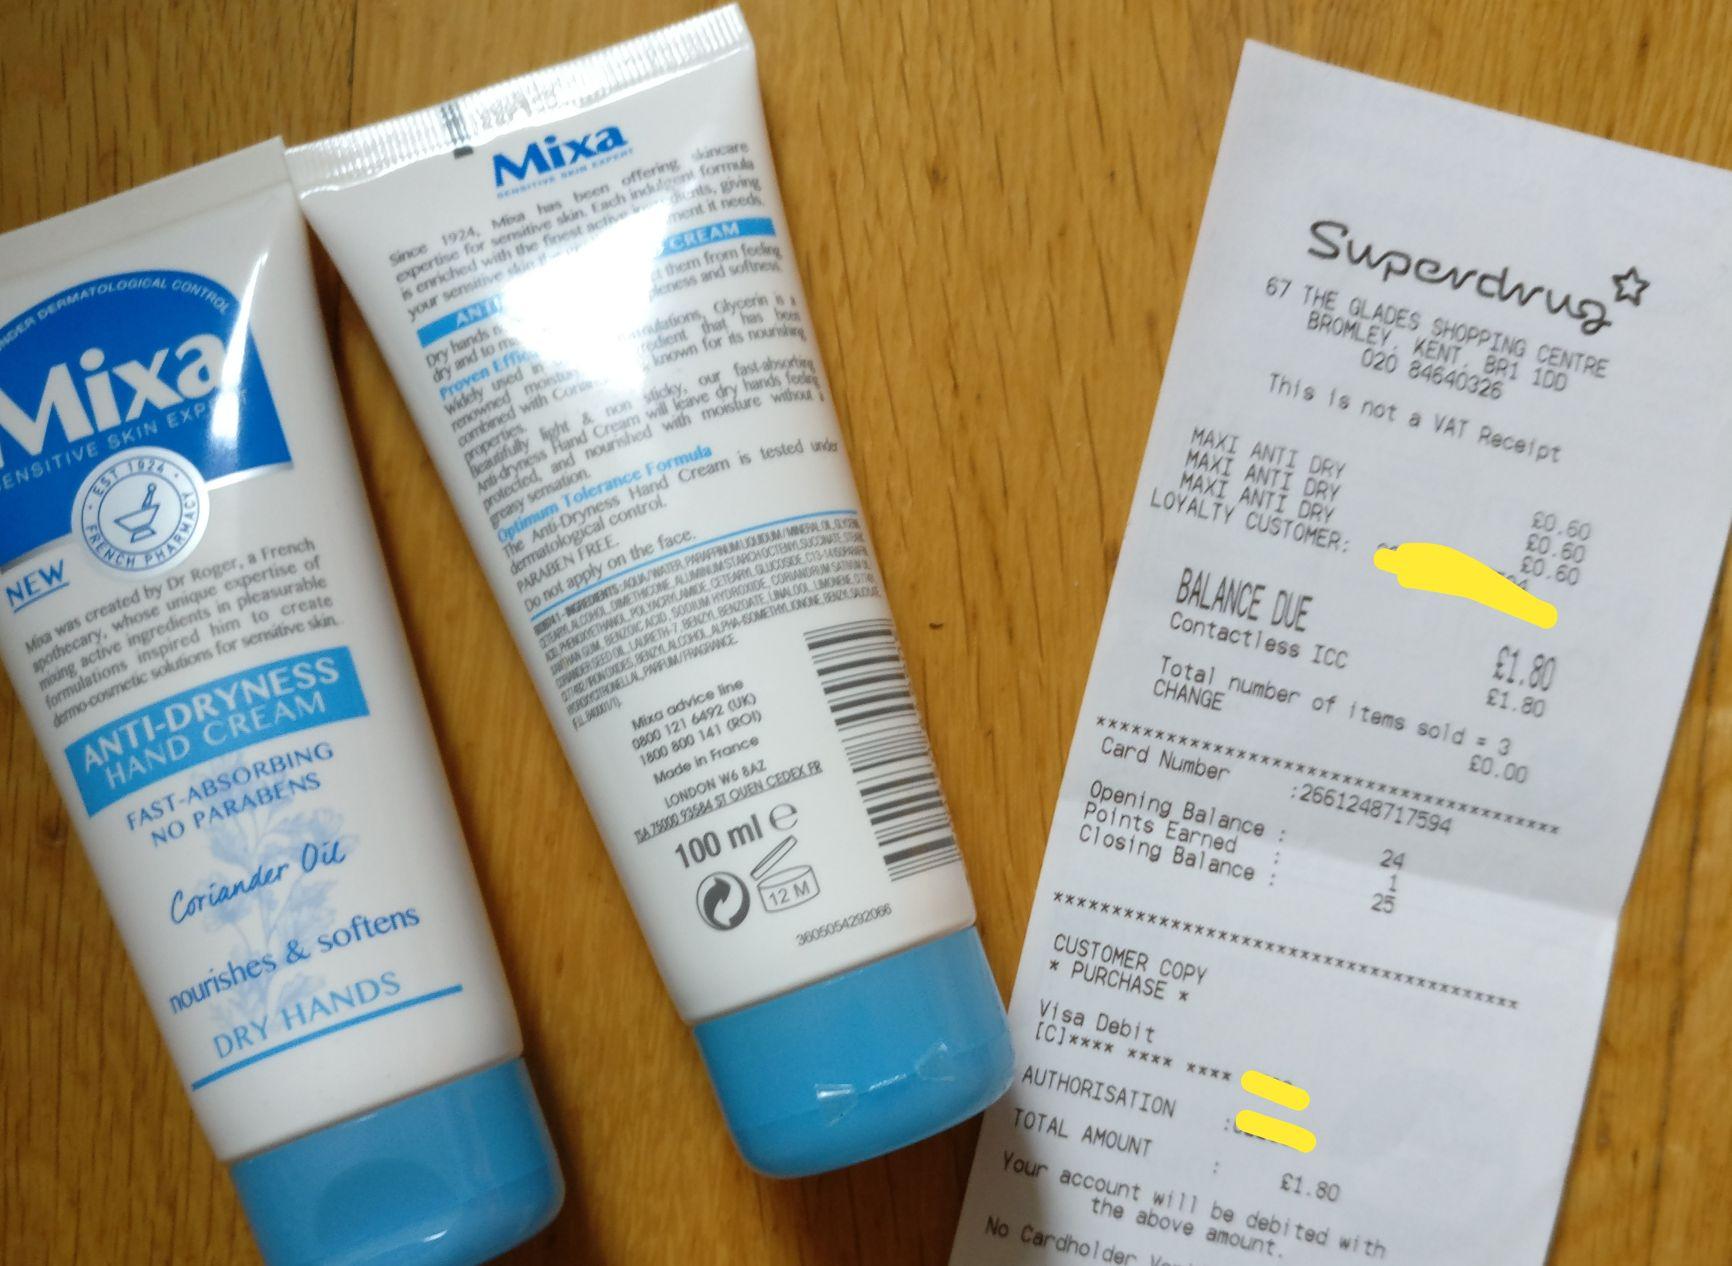 Mixa hand cream 60p Superdrug